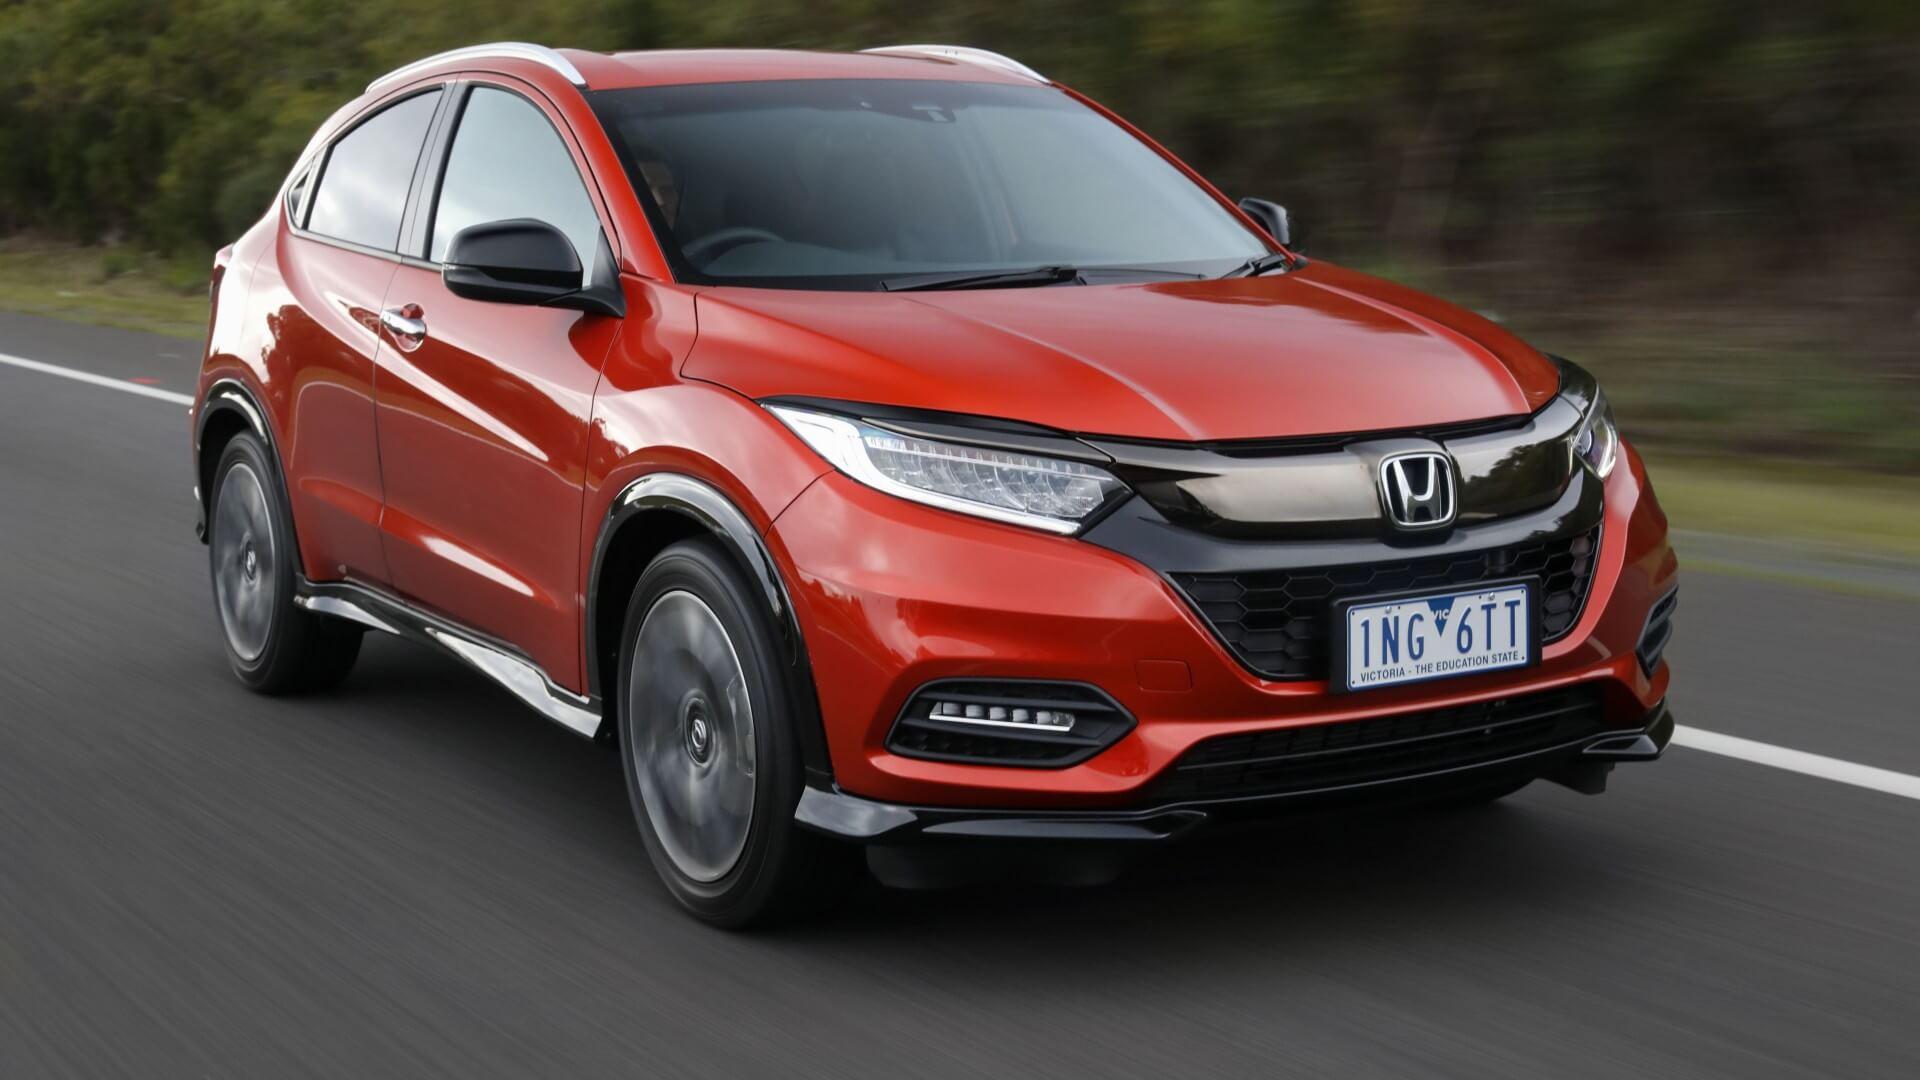 Updated Honda HR-V is presented in Japan as Vezel